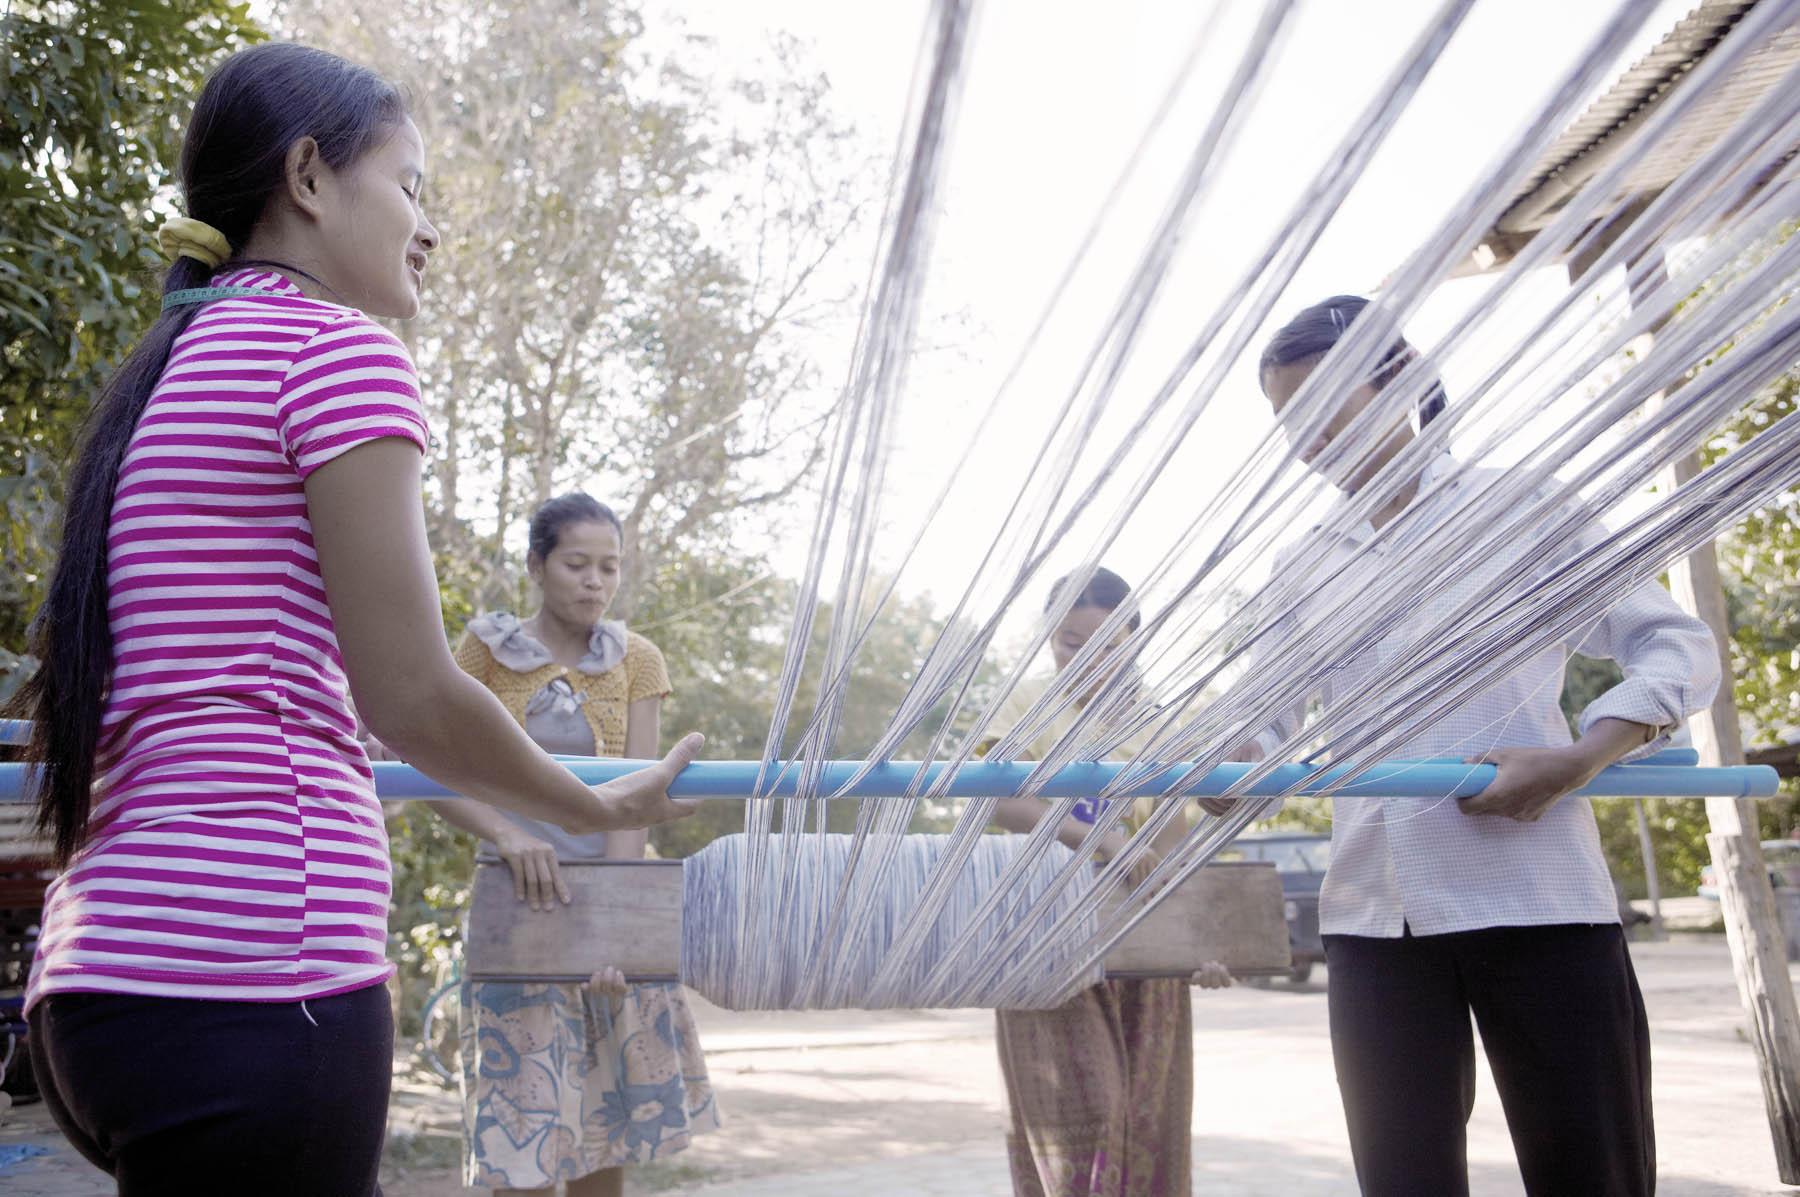 People_of Cambodia_2533.jpg